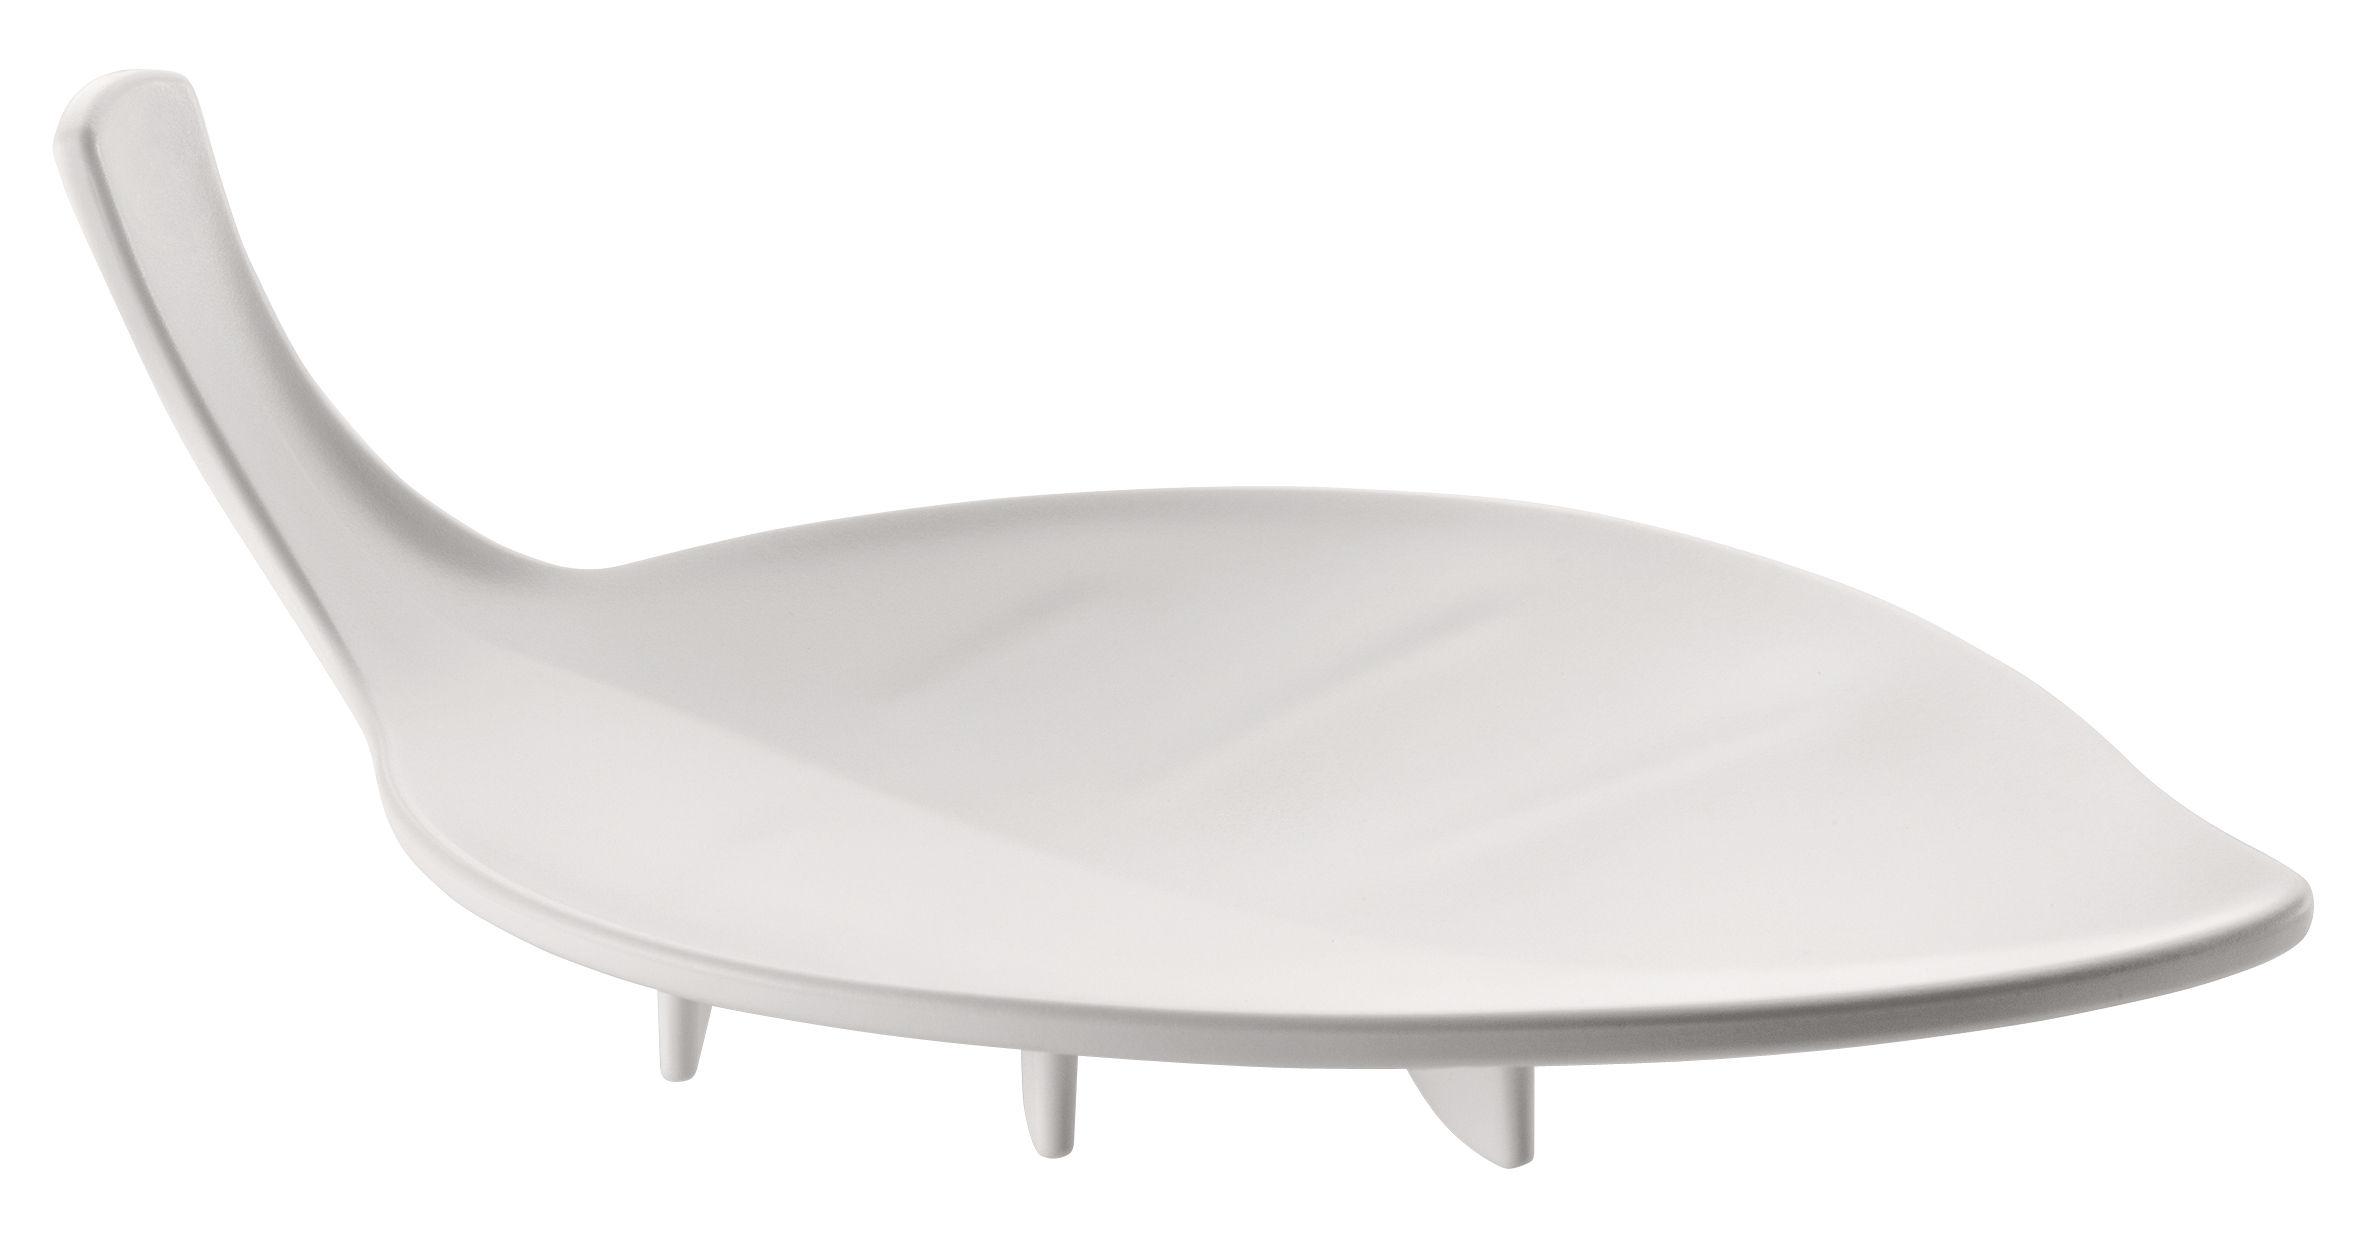 Accessories - Bathroom Accessories - Sense Soap holder by Koziol - Opaque white - Plastic